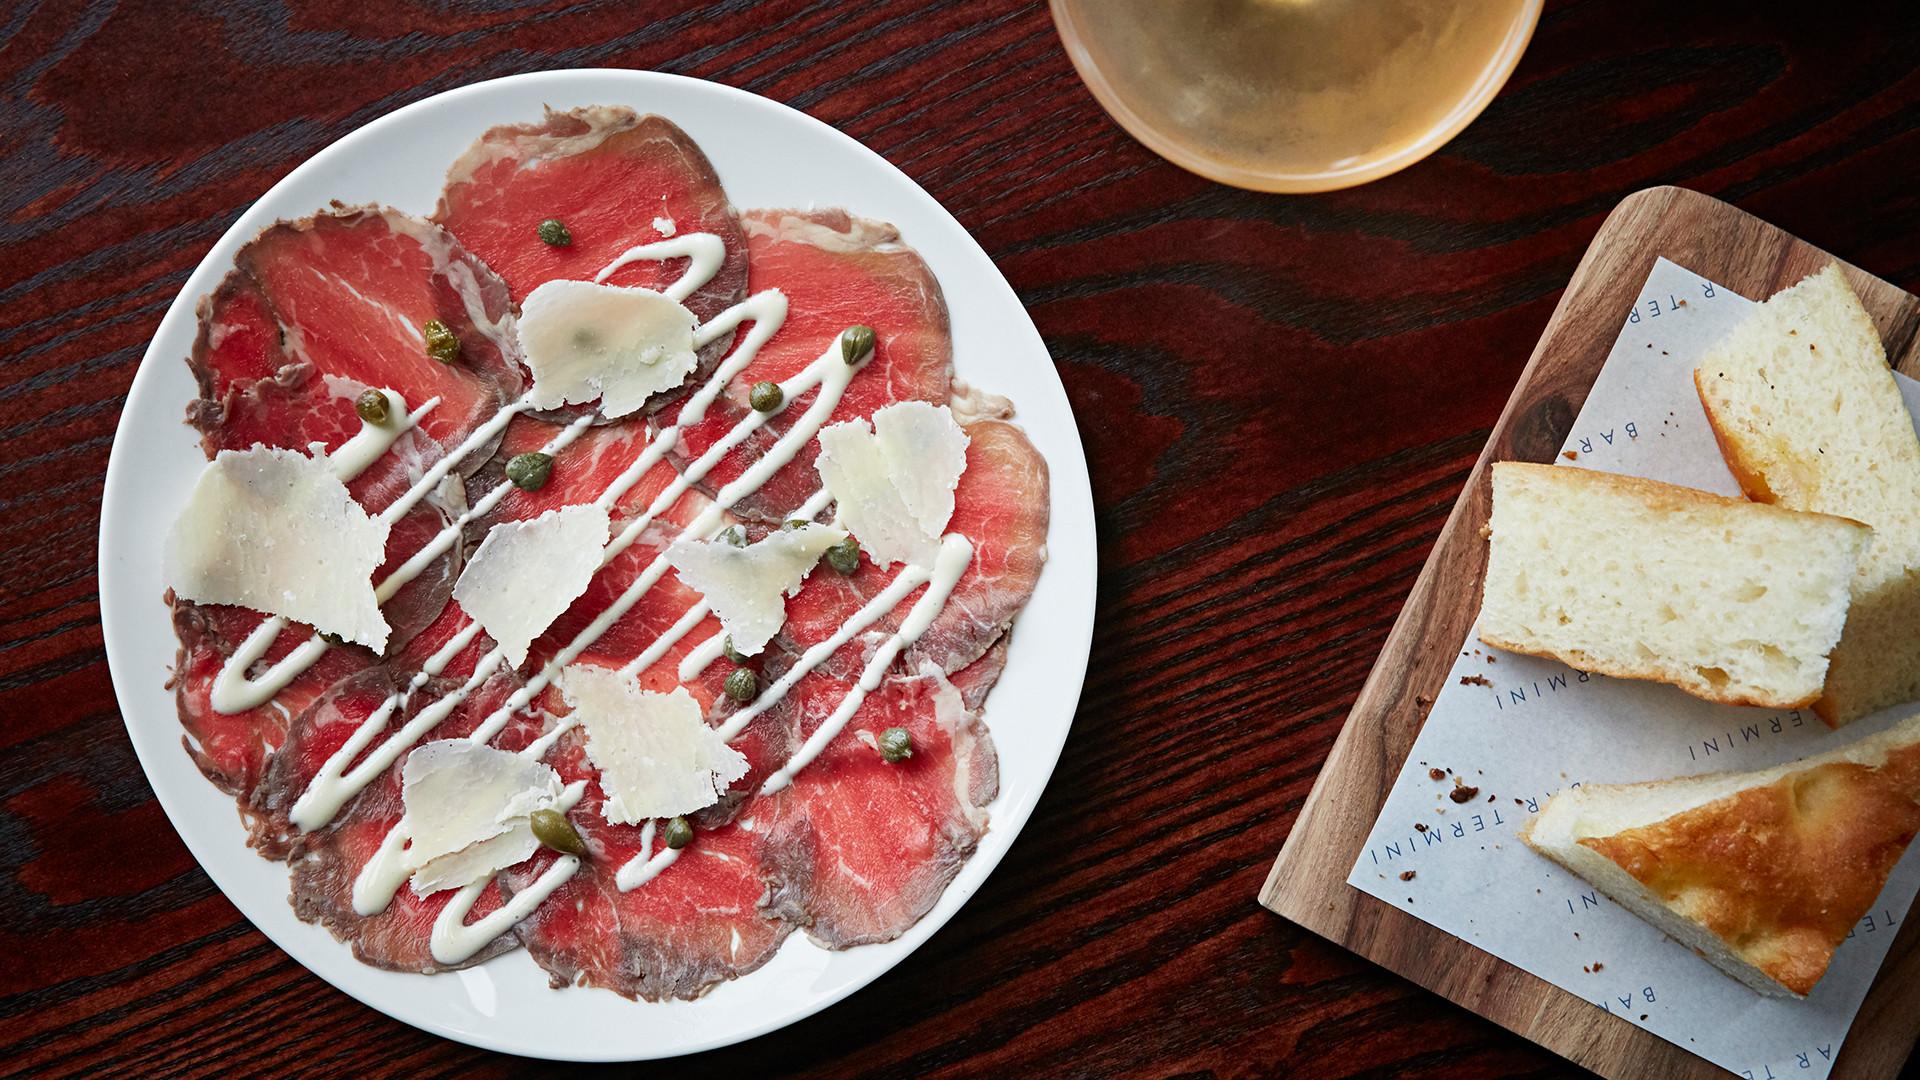 Beef carpaccio at Bar Termini